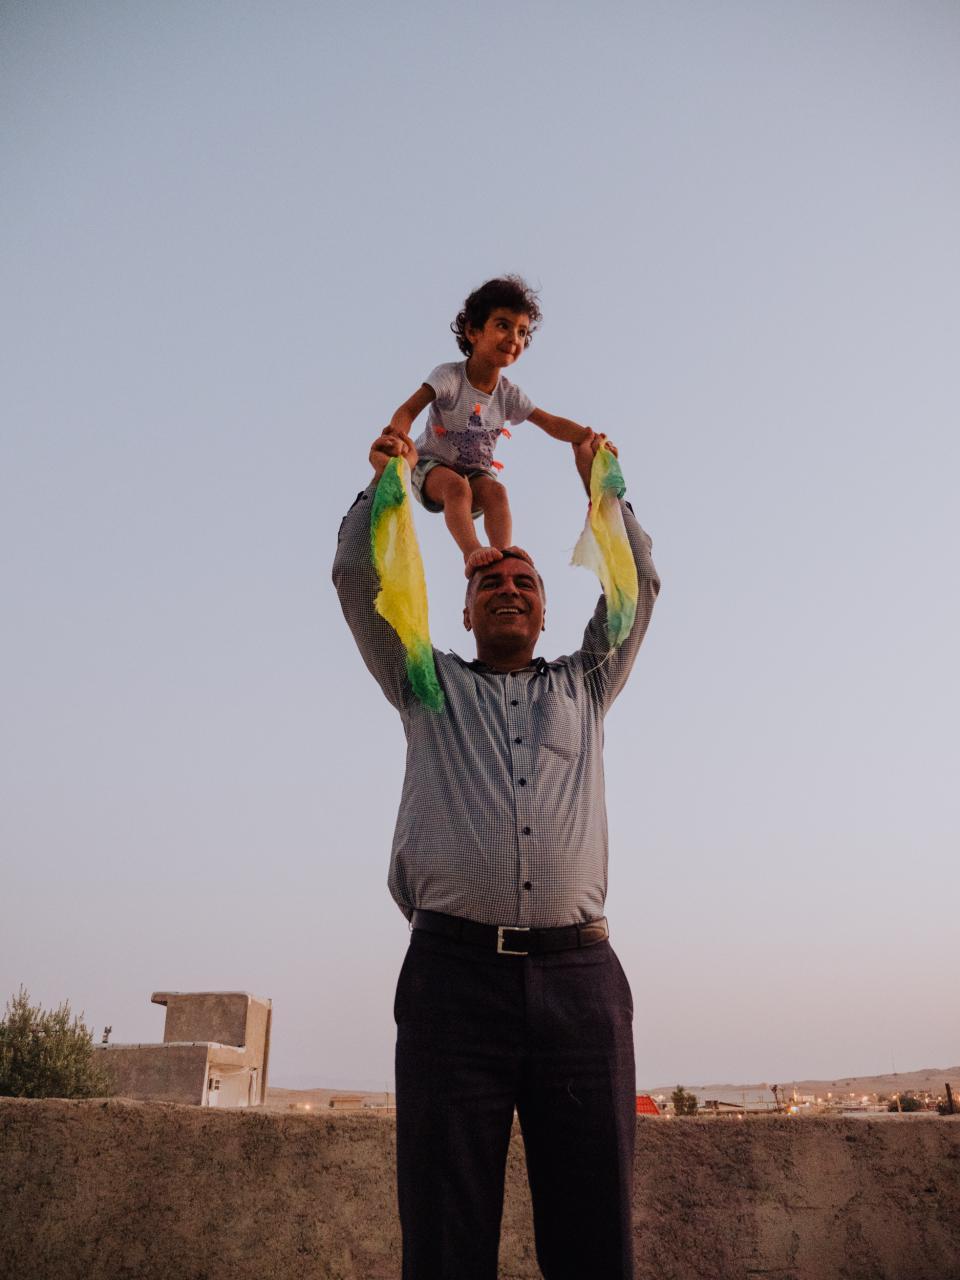 Saman-Shariati-Hometown-6.jpg